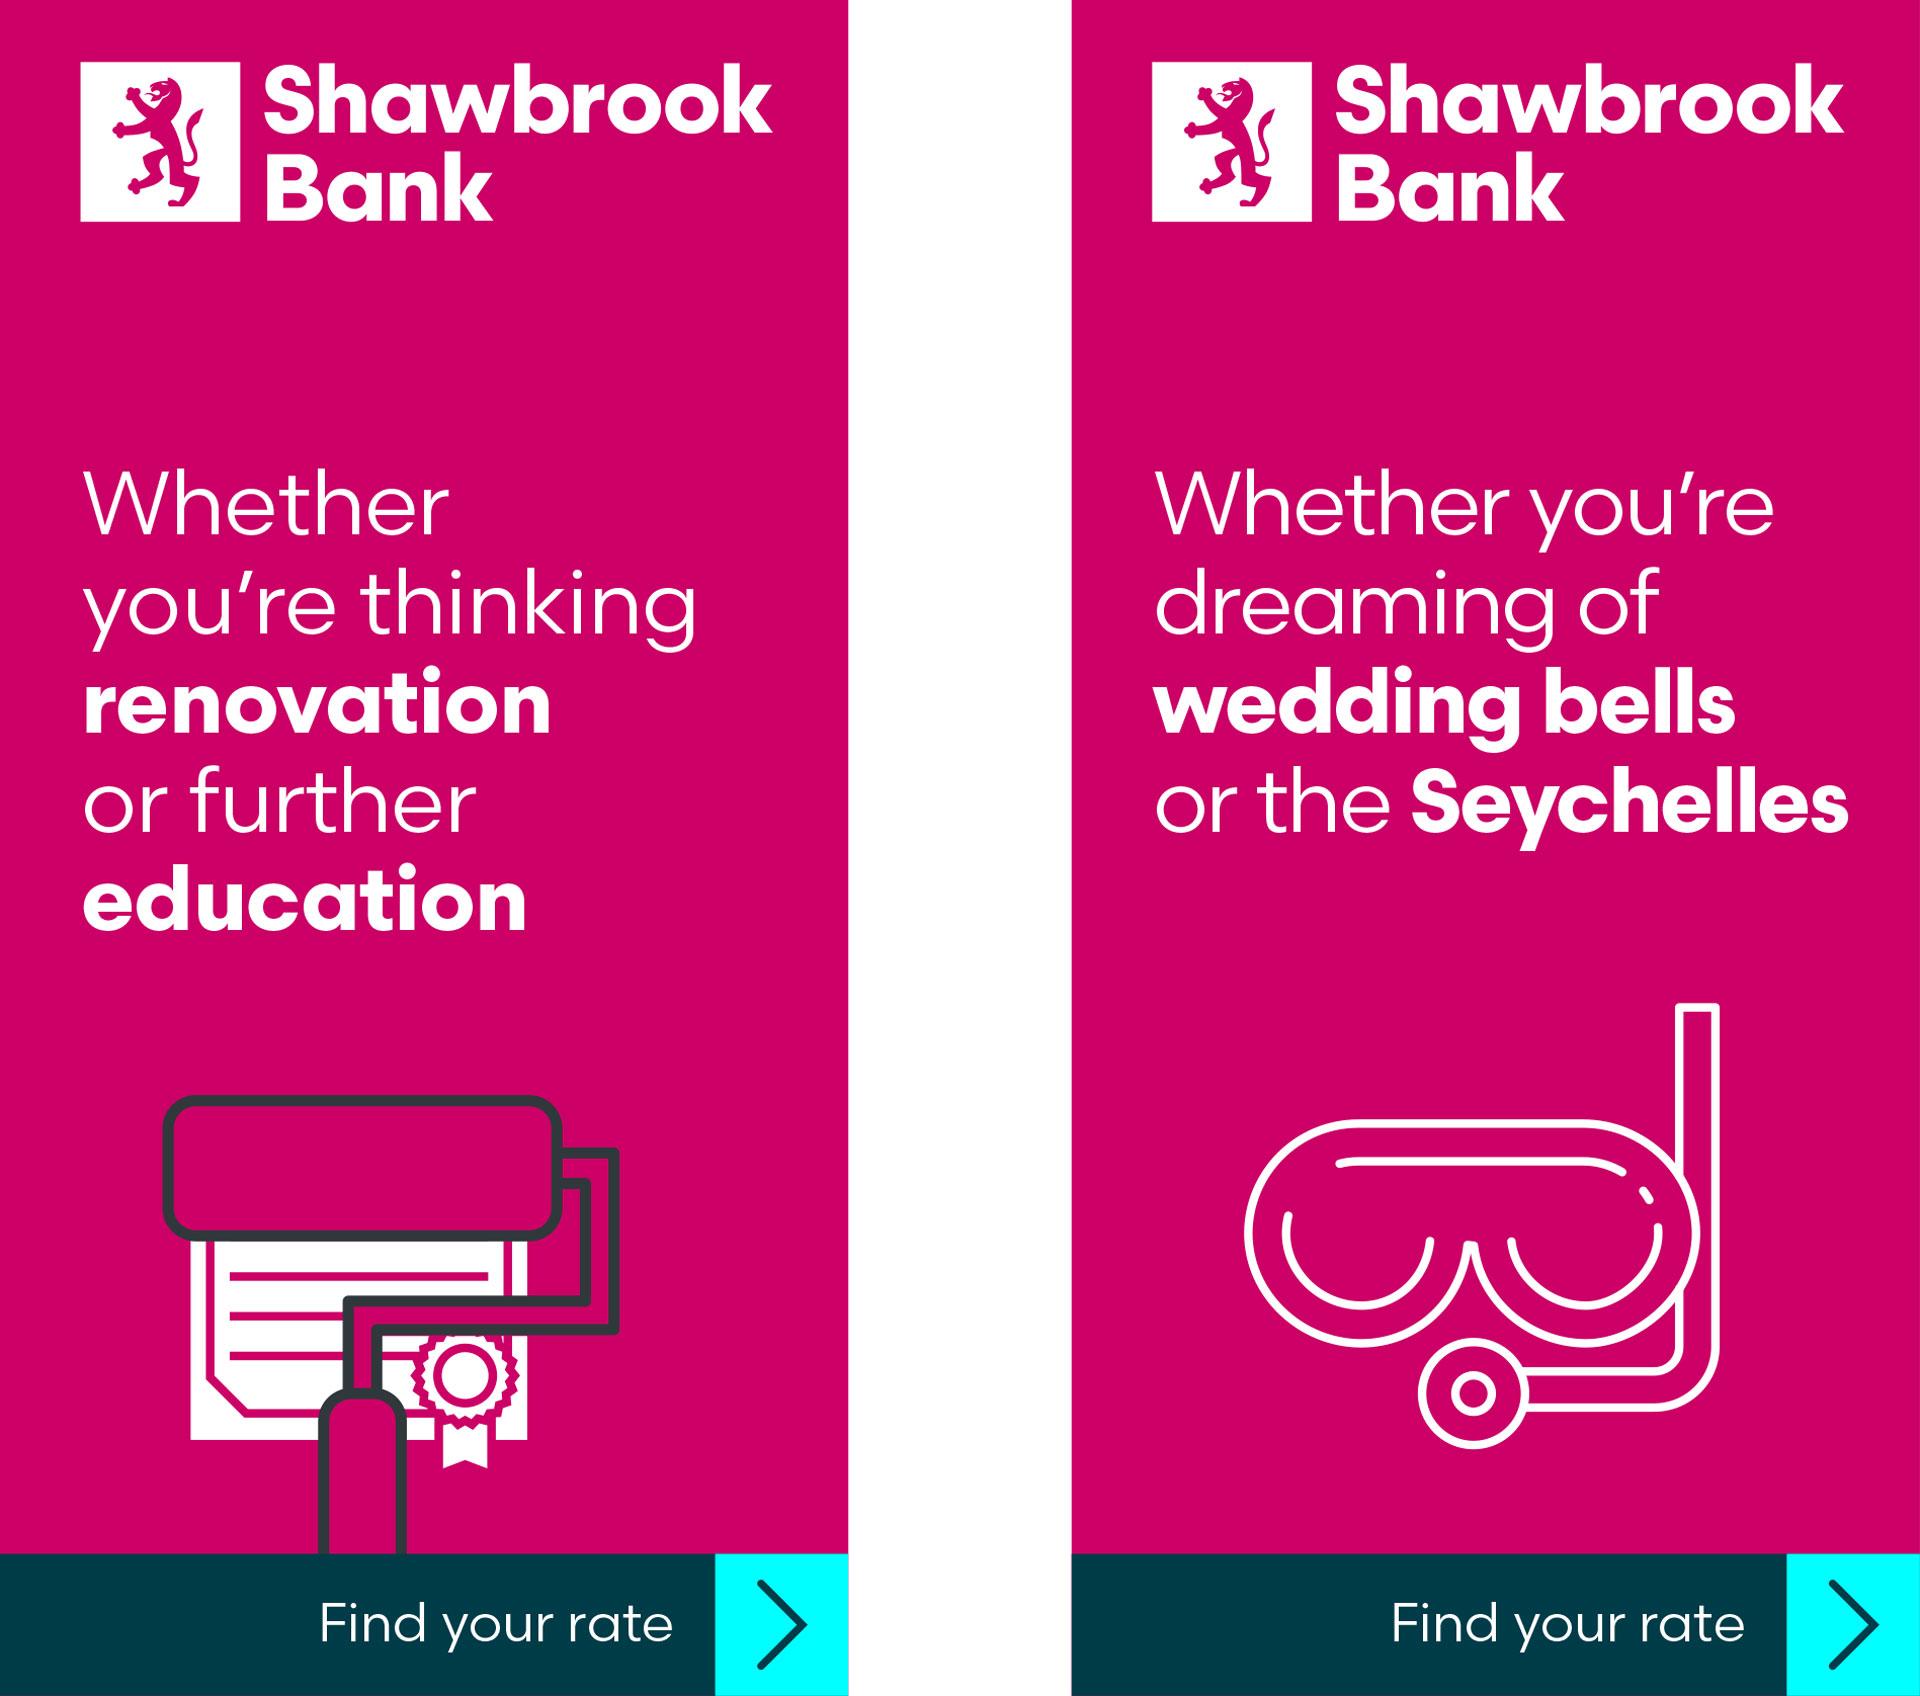 Glendale Creative Shawbrook Digital Advert Design